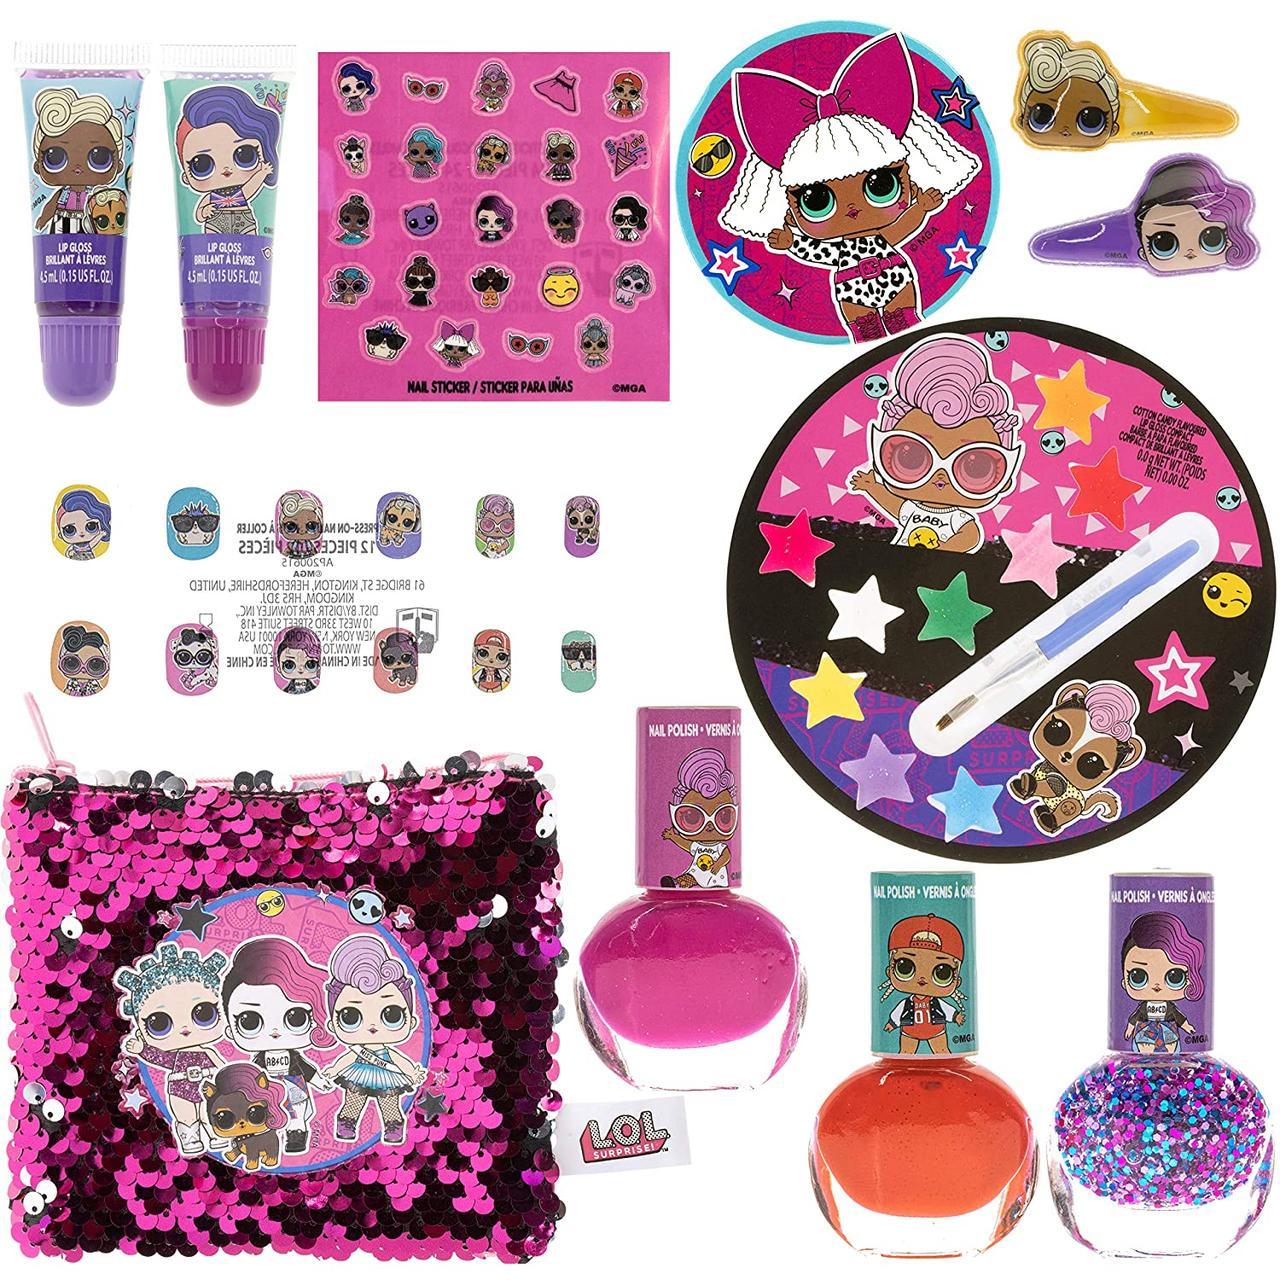 Набор косметика для девочки ЛОЛ Townley Girl Оригинал из США